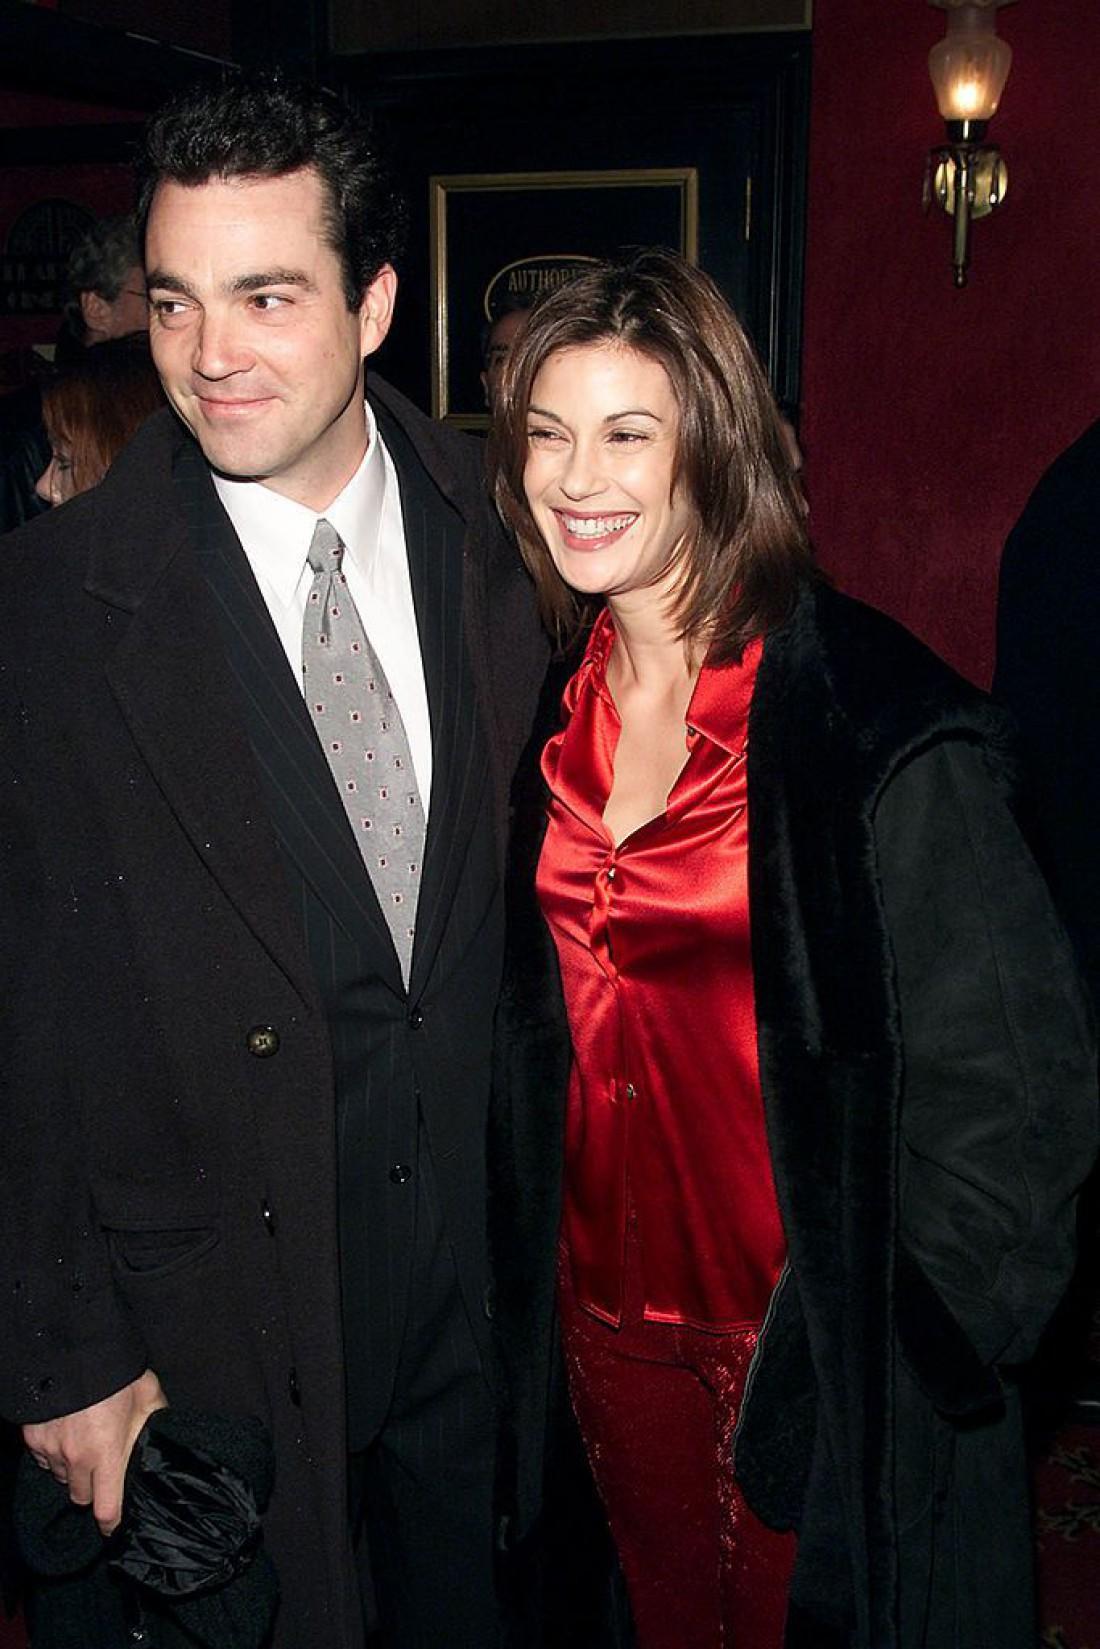 Тери вышла замуж во второй раз за актера Джона Тенни